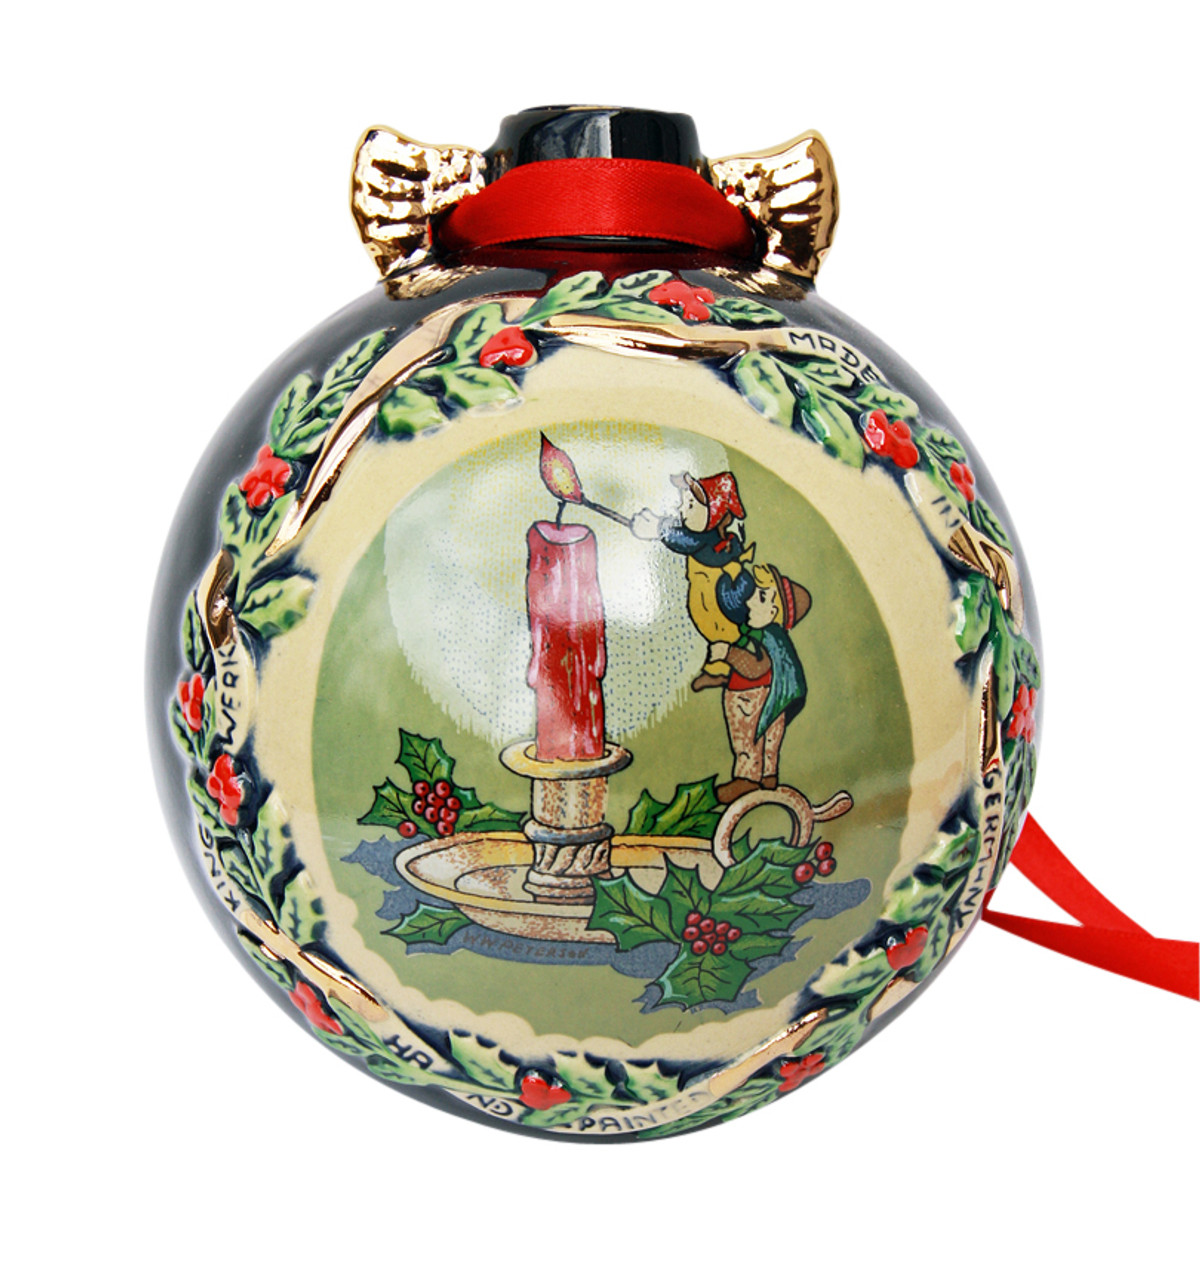 Christmas Candle and Santa Ceramic Large Christmas Ornament Decoration